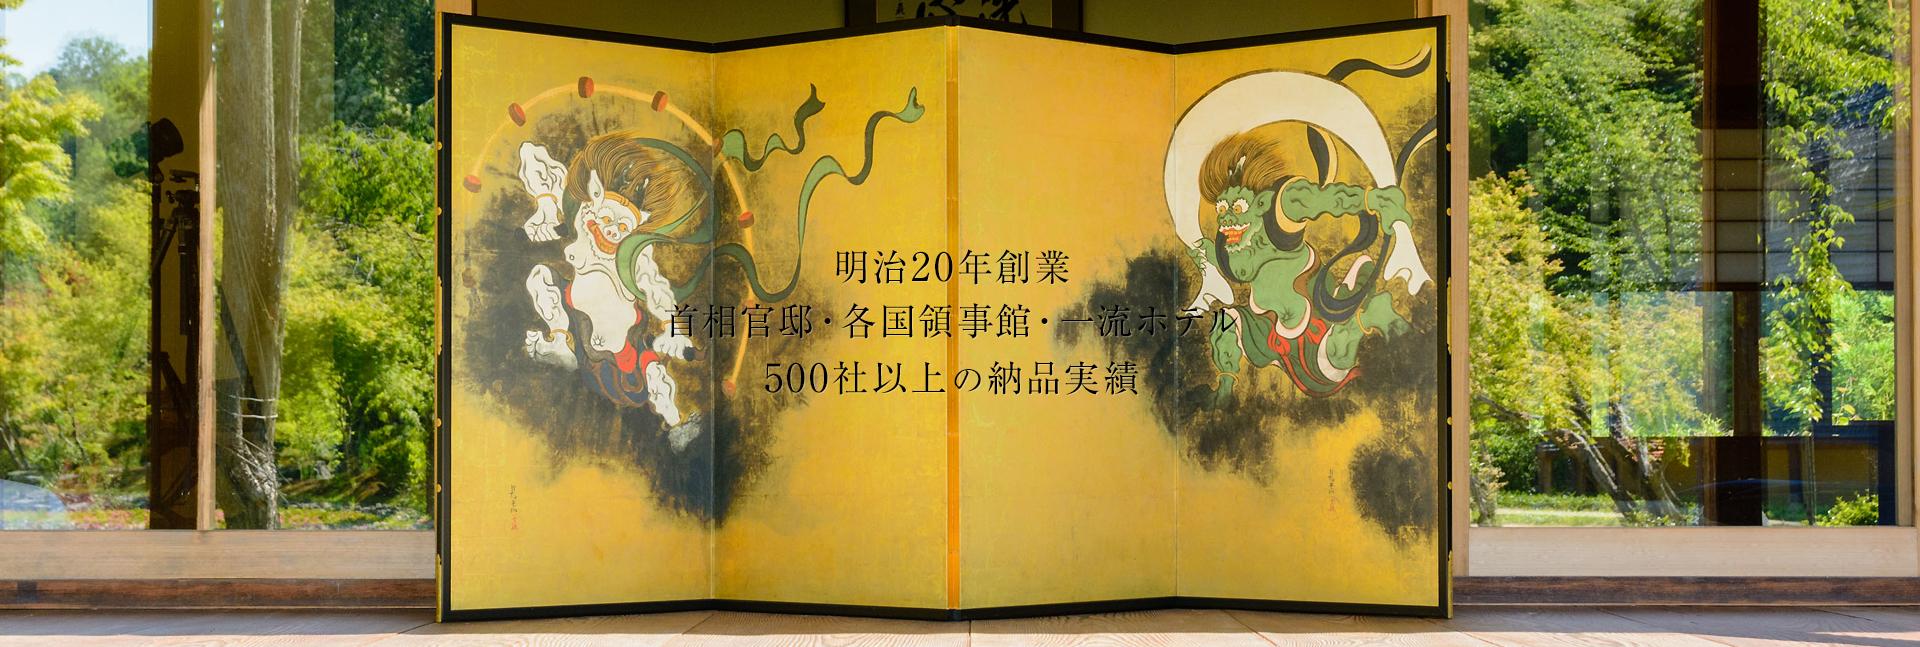 映画「散り椿」長谷川等伯 複製屏風